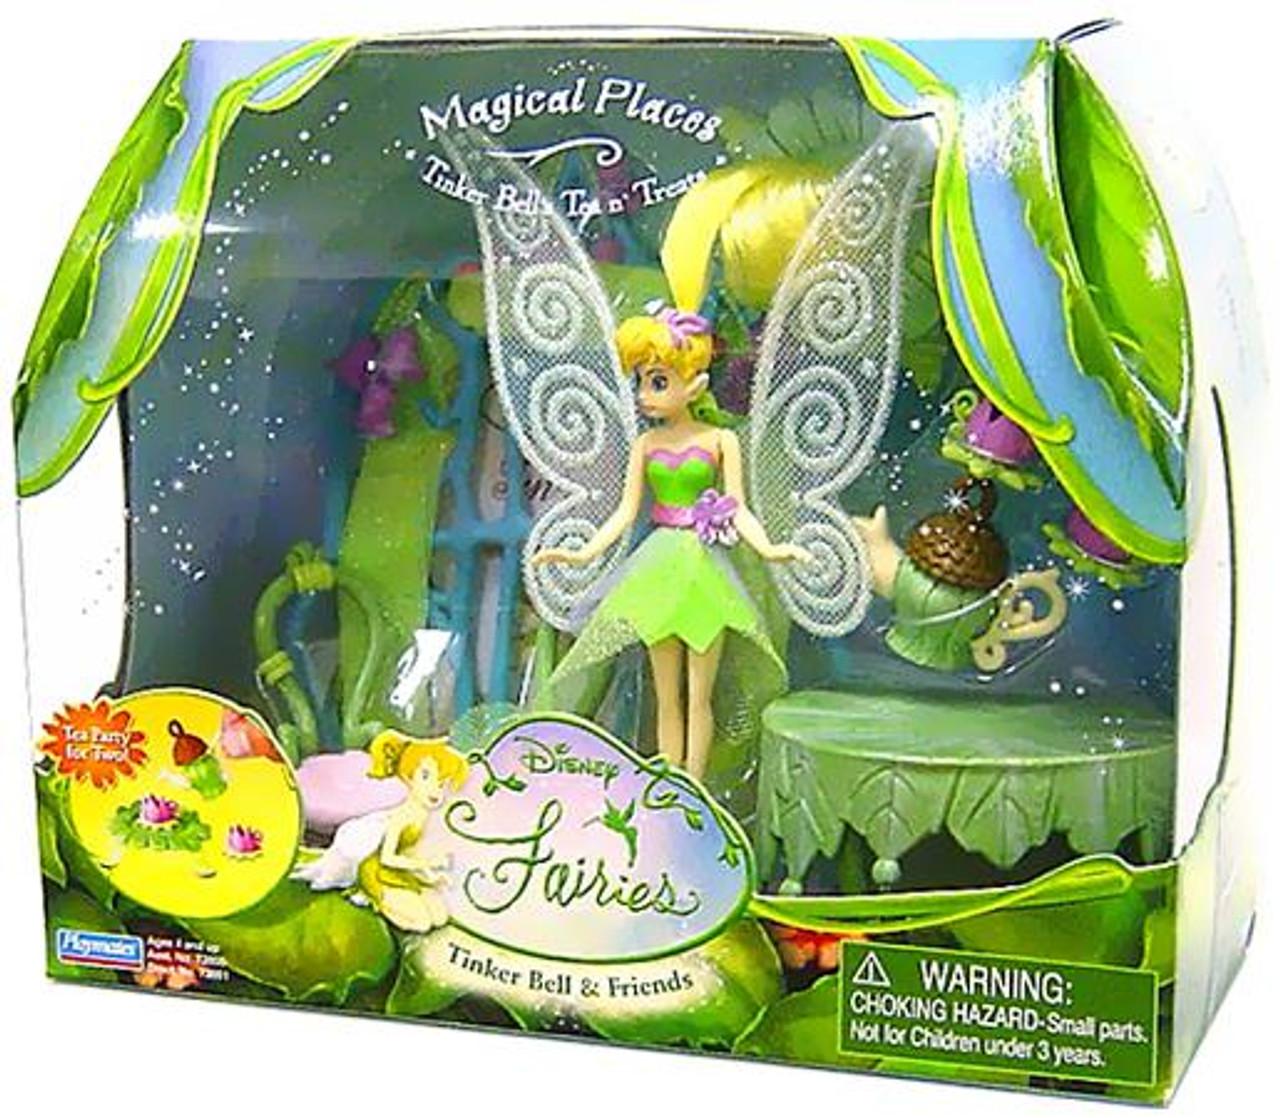 Disney Fairies Tinker Bell & Friends Tinker Bell's Tea n' Treats Playset [Magical Places]